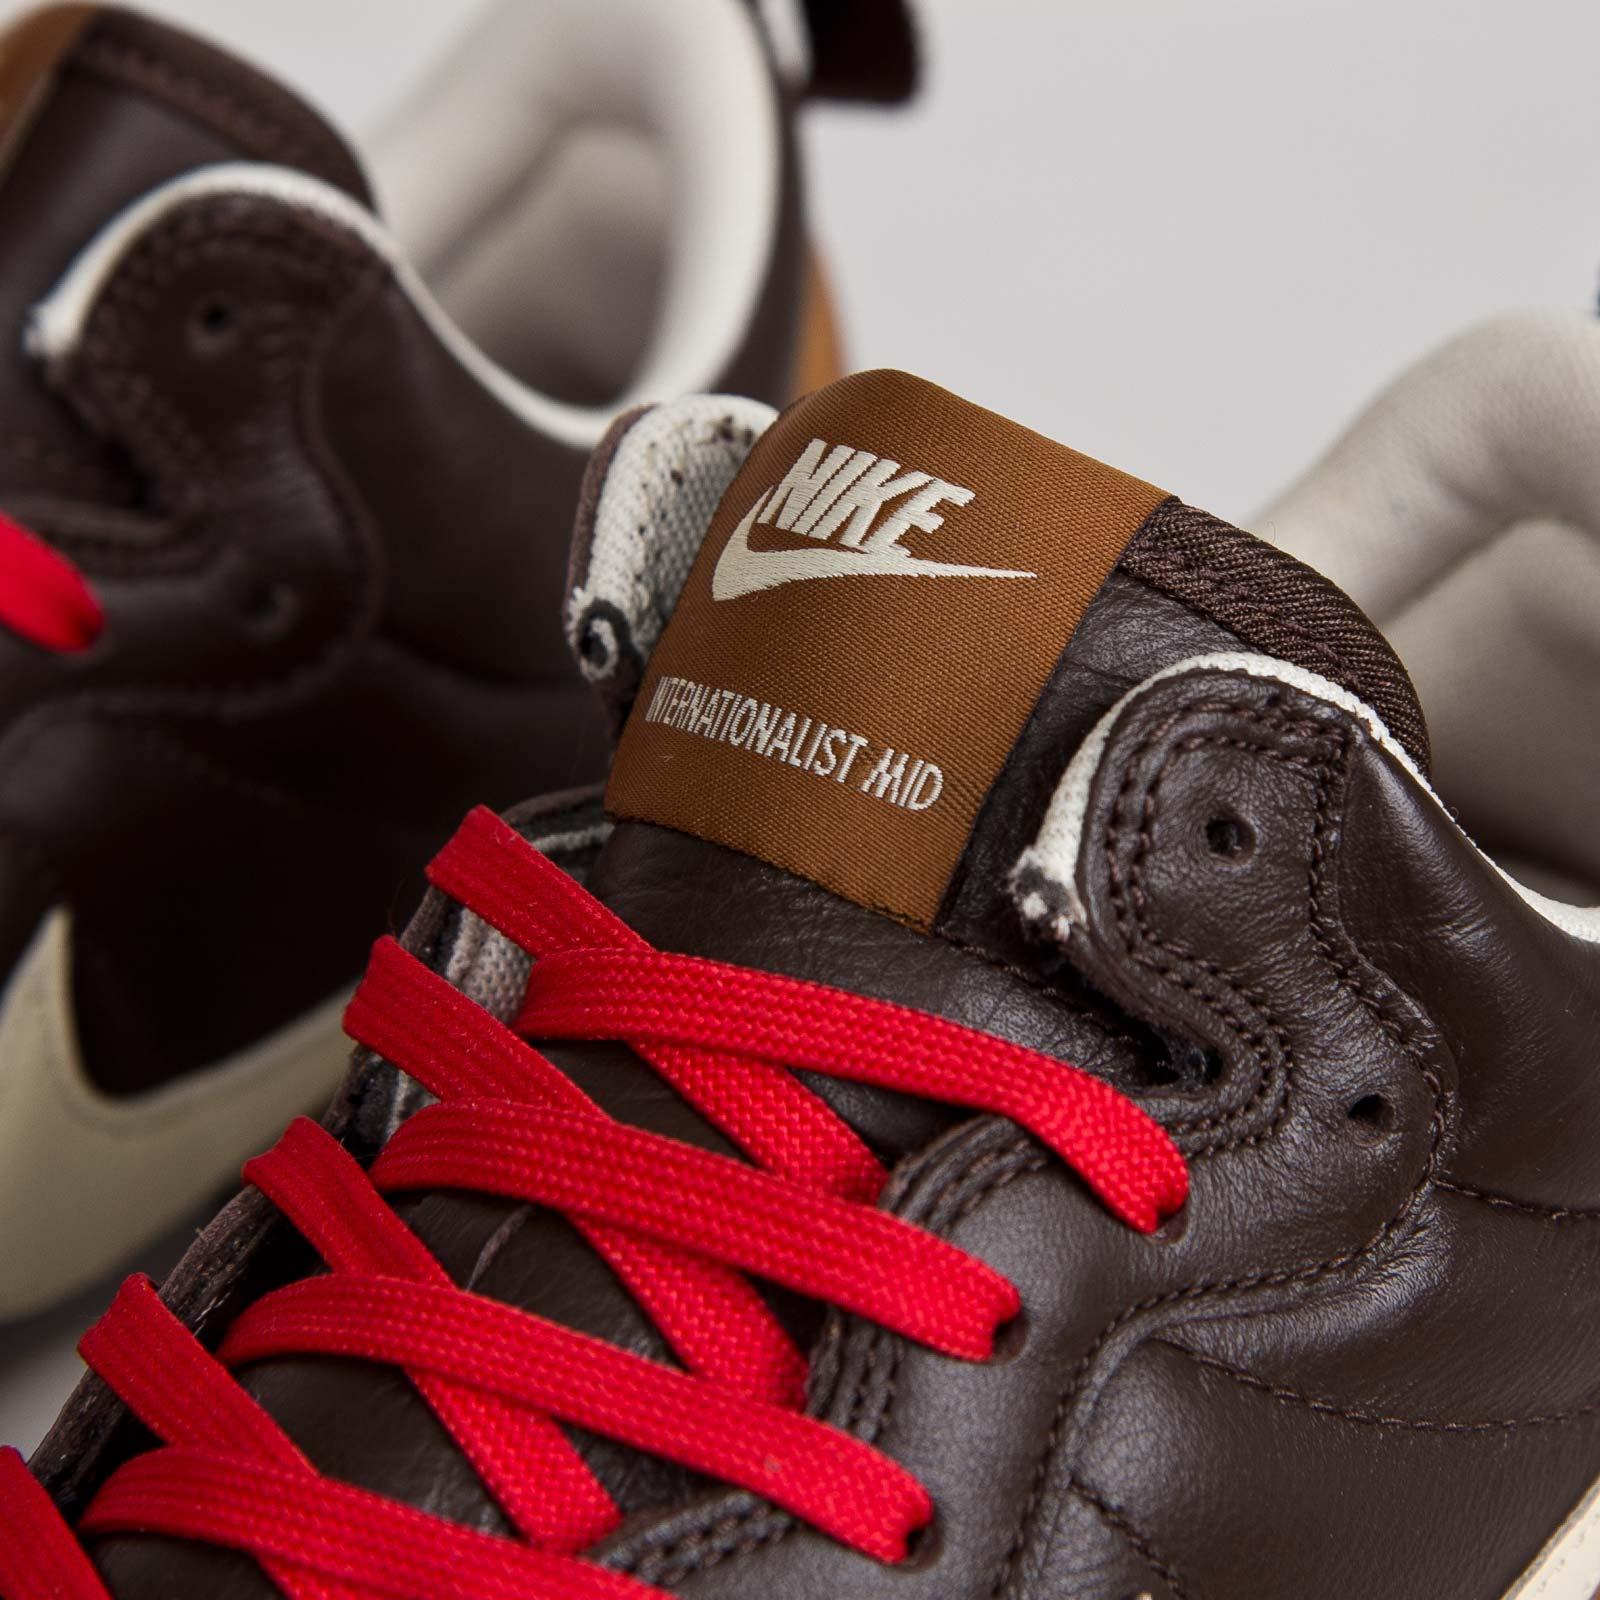 huge discount 65bf6 e6730 ... Nike Internationalist Mid Escape QS ...